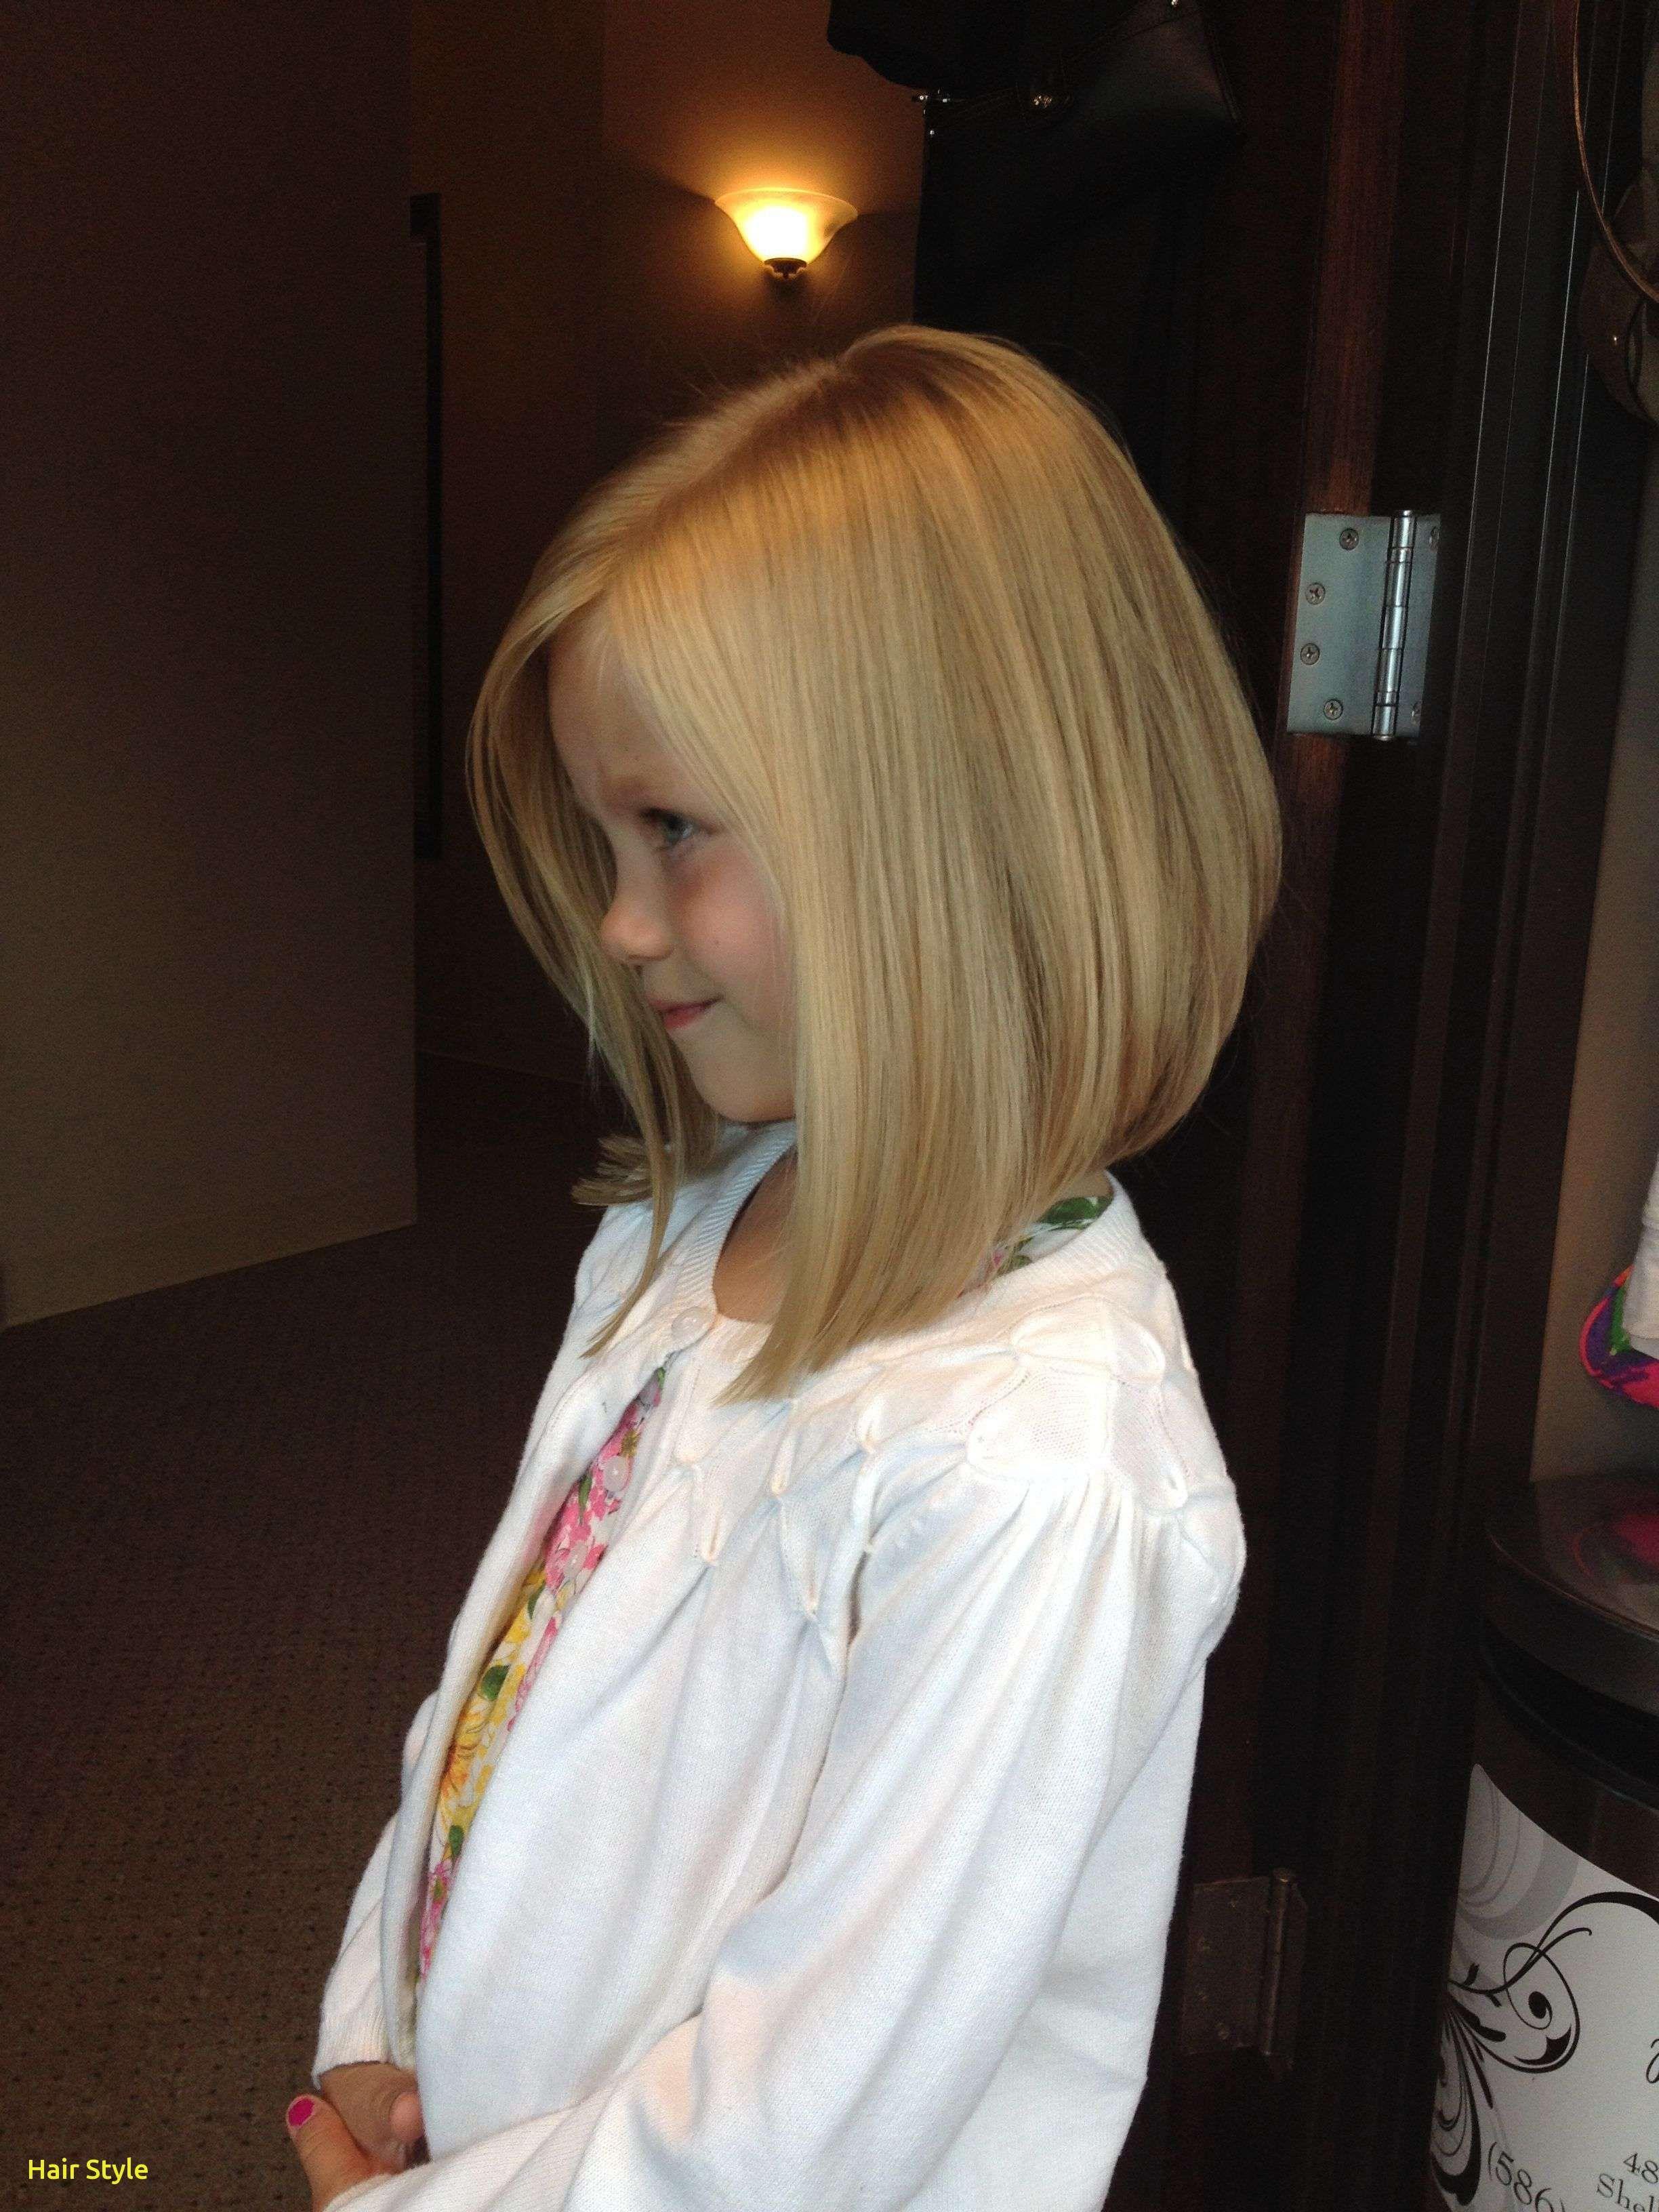 Frisches Kleines Madchen Bob Haircut Mit Pony Hair Hair Hair